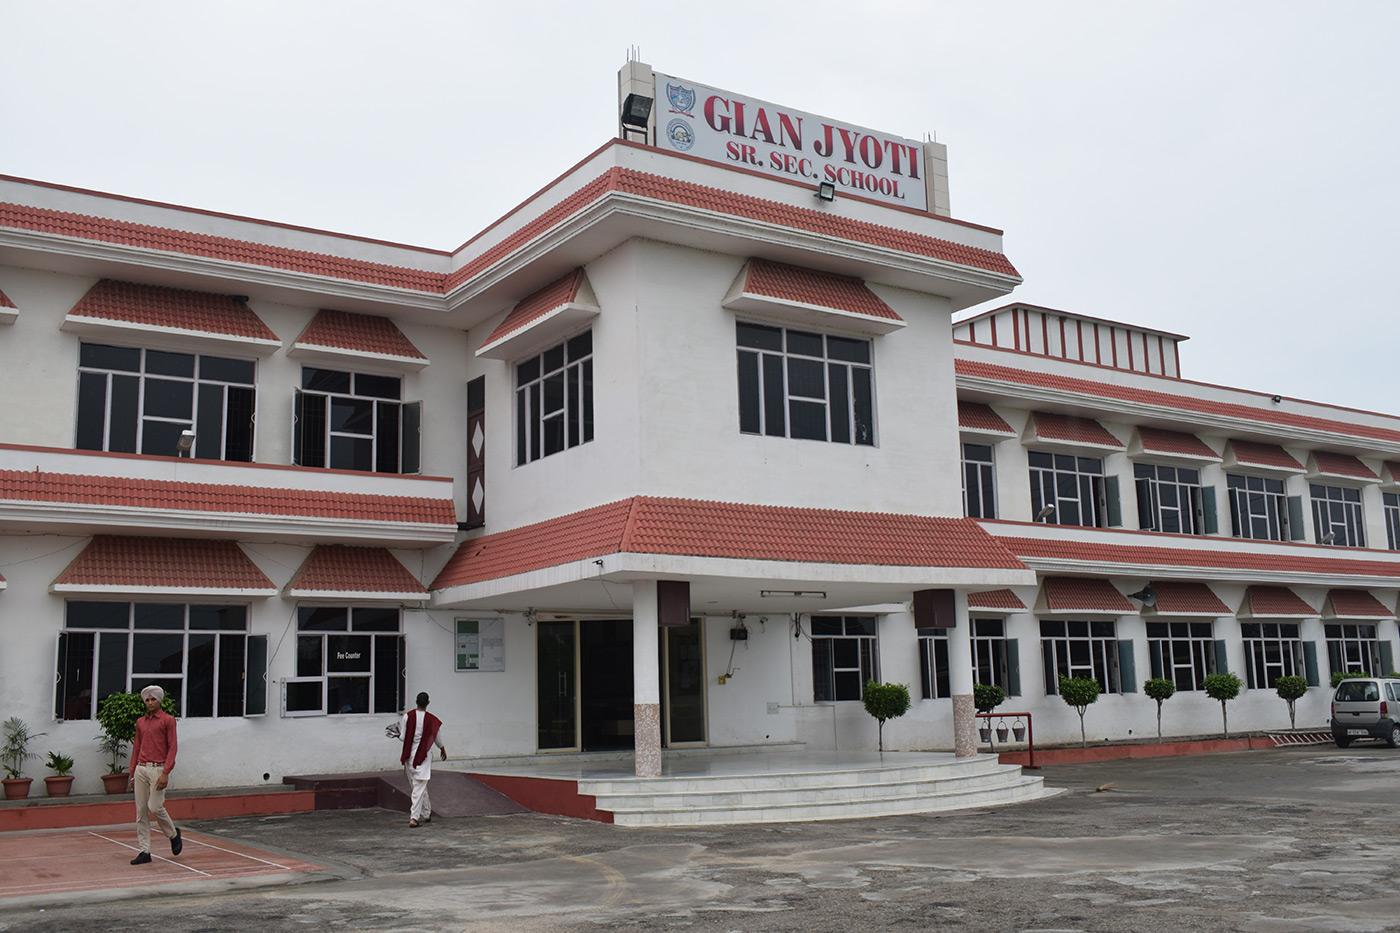 The cradle: Gian Jyoti school in Darapur, where Harmanpreet studied